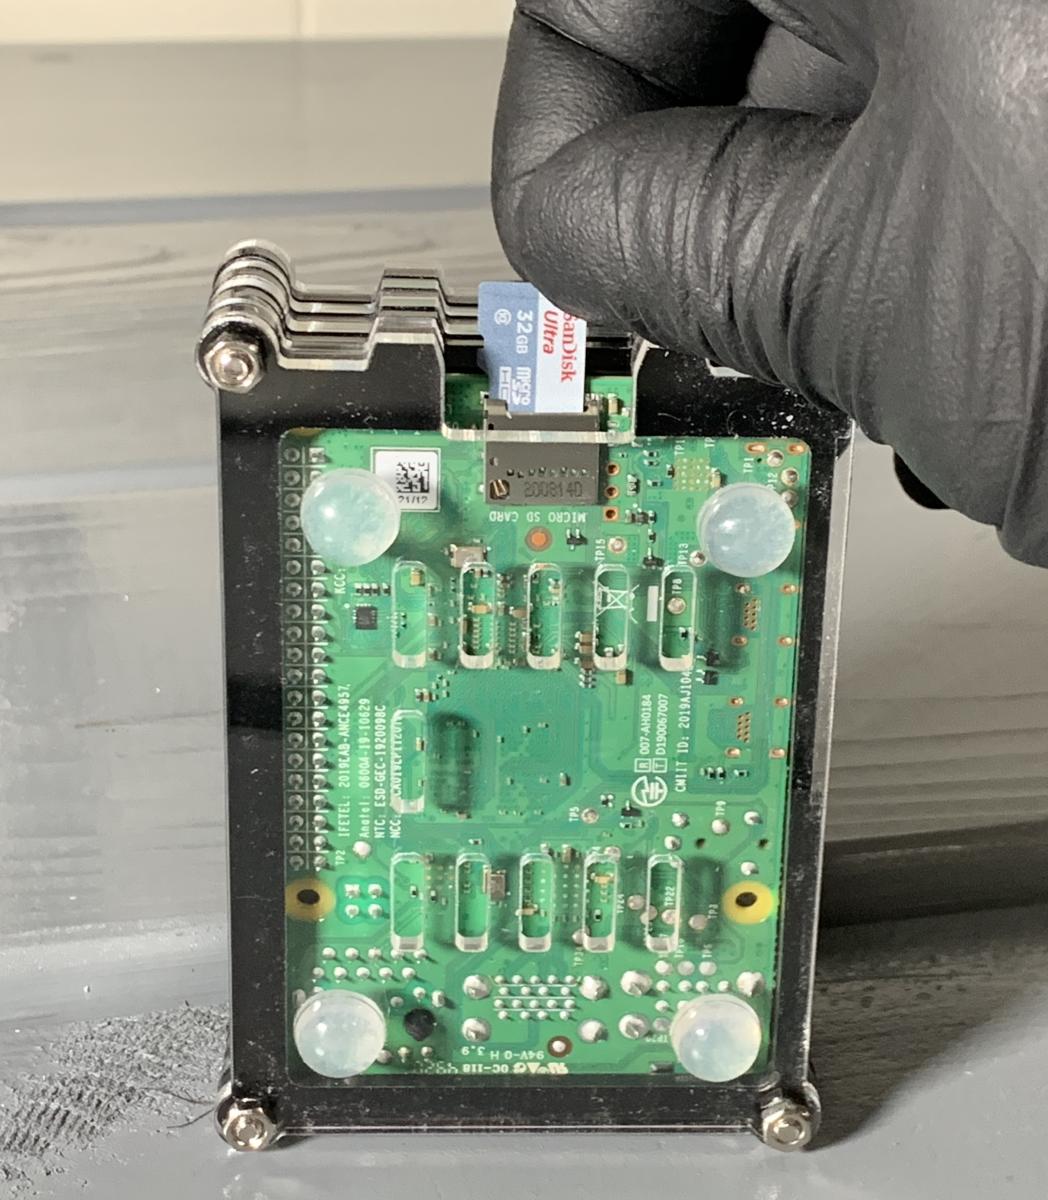 To build a bitcoin node you should insert the Micro SD card